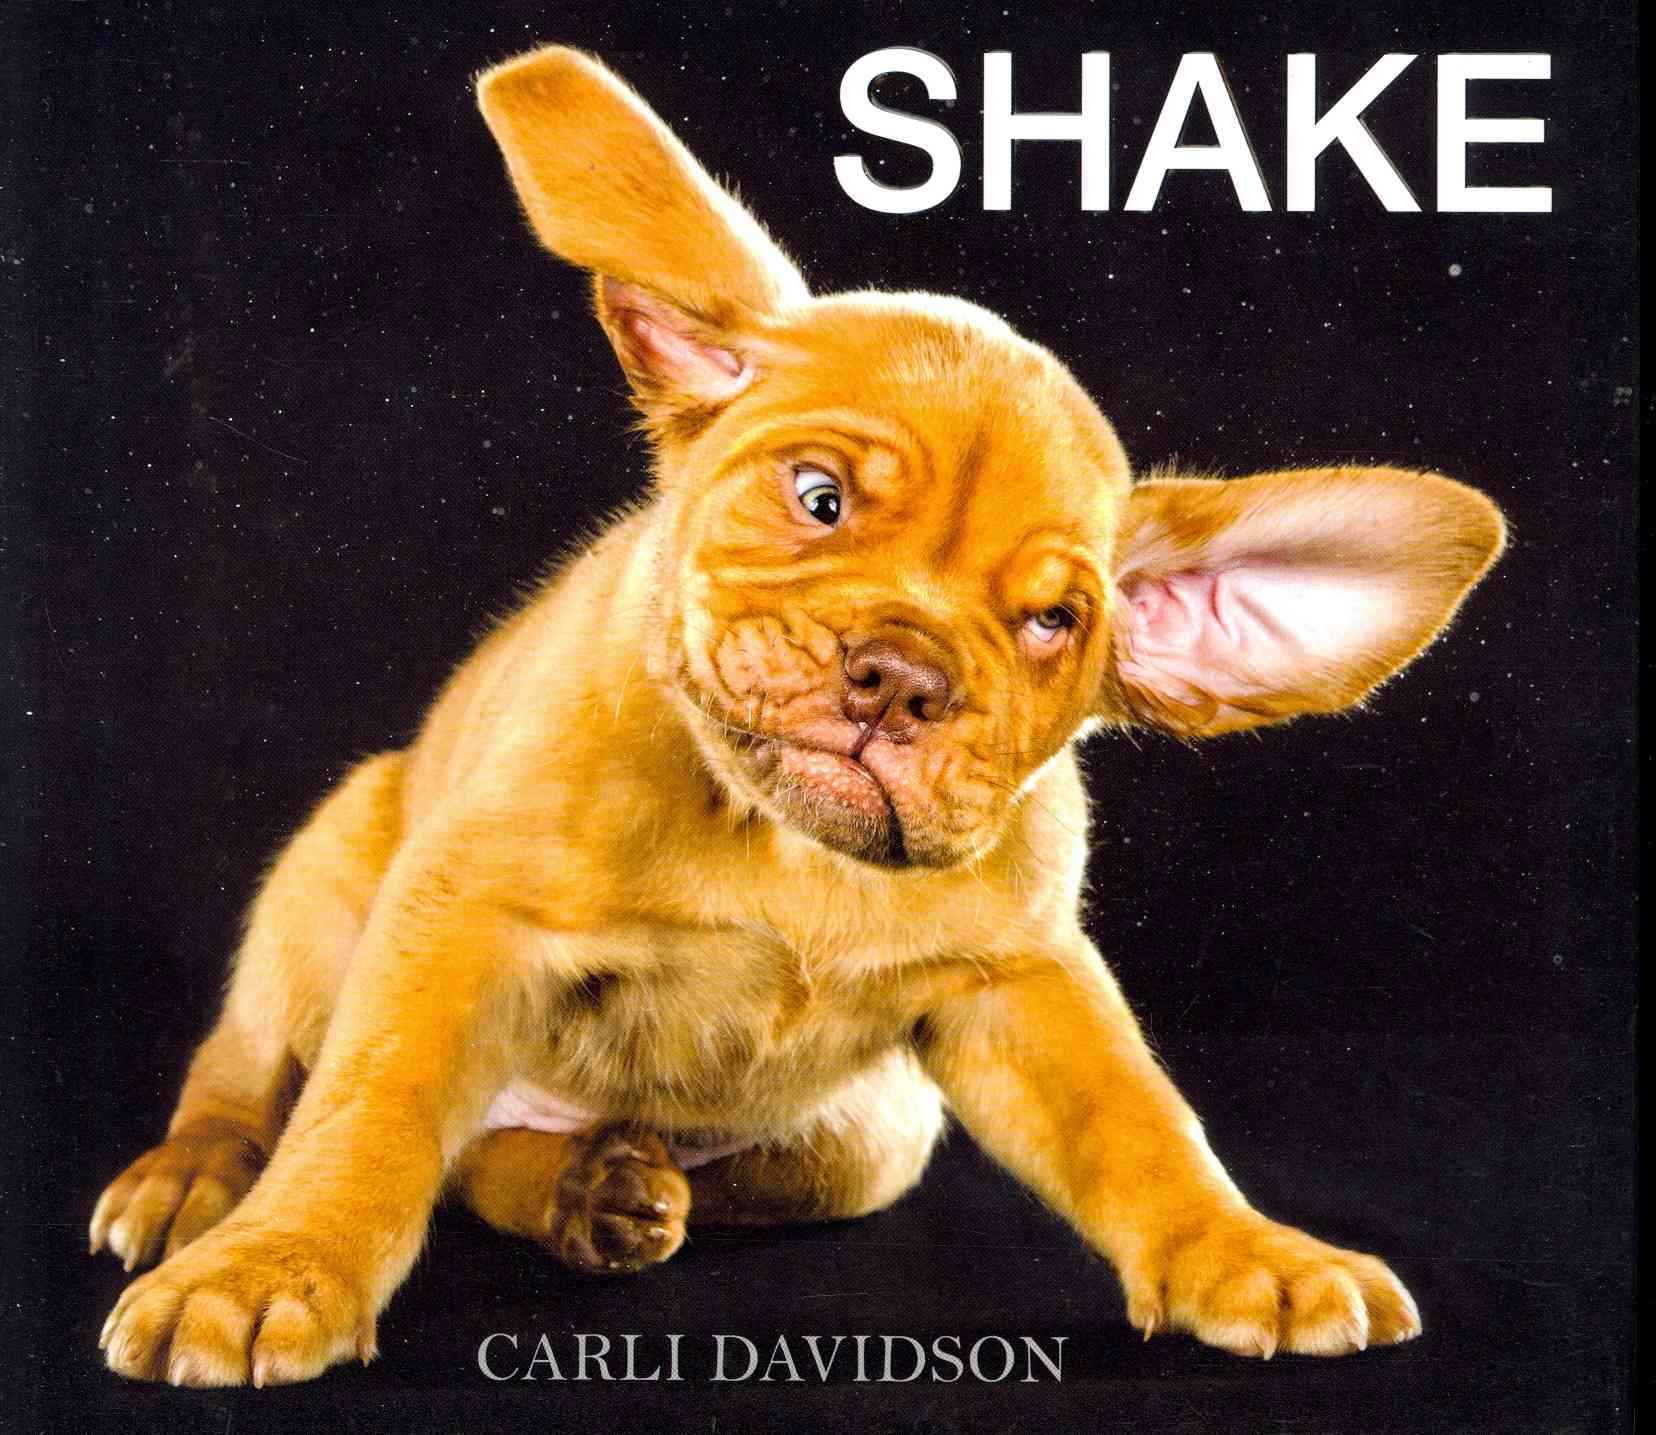 Shake (Hardcover)